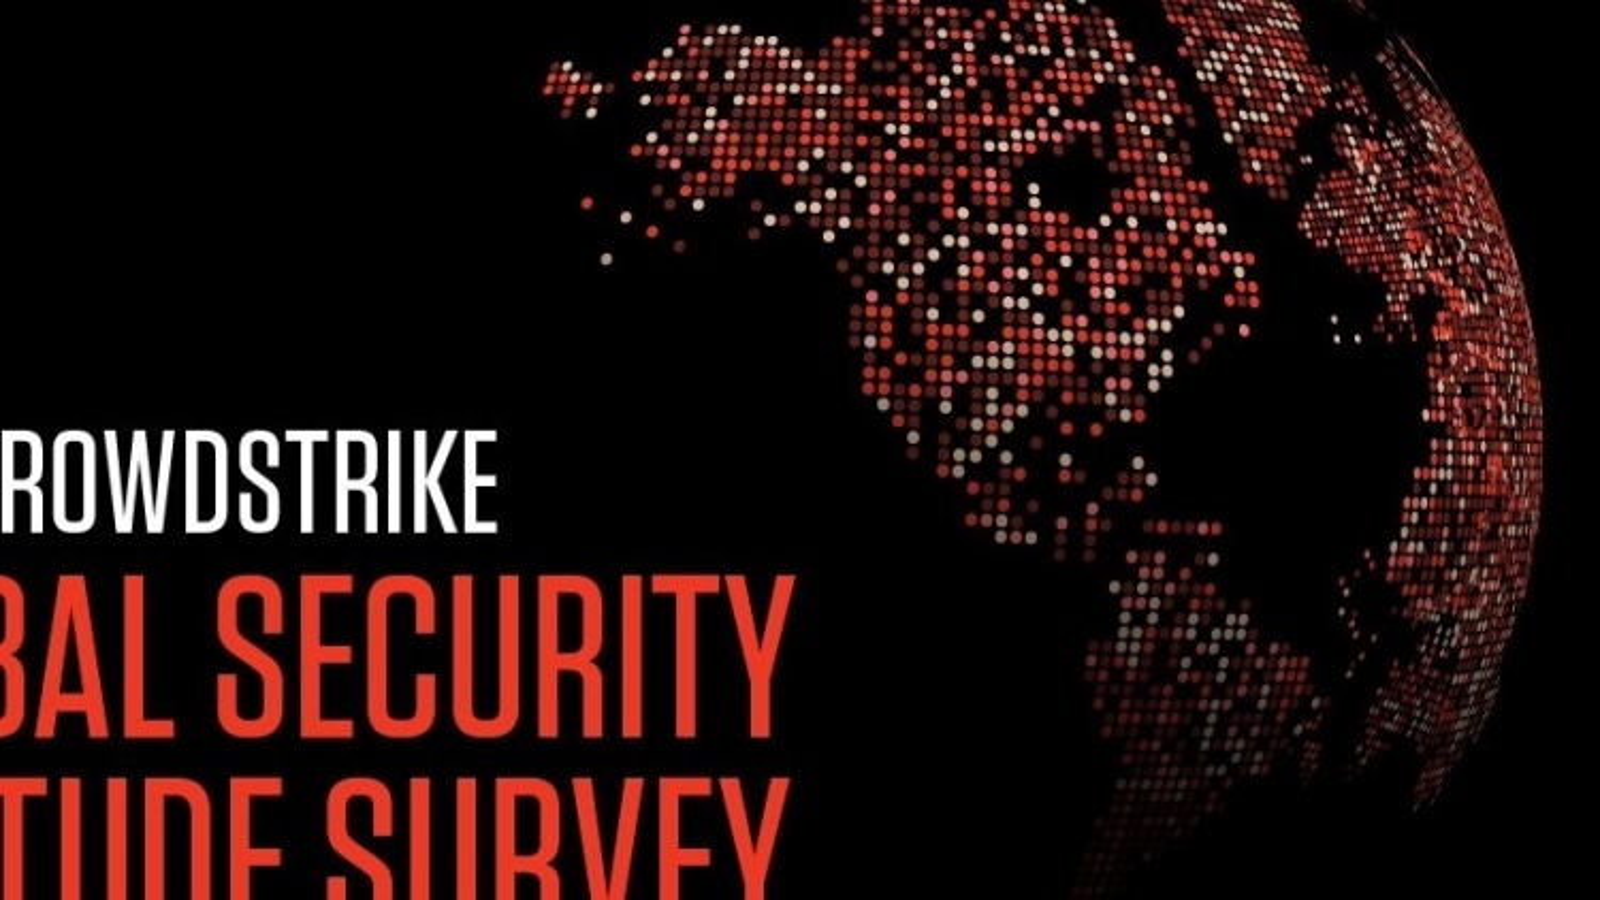 Top 9 nguy cơ an ninh toàn cầu trong năm 2021